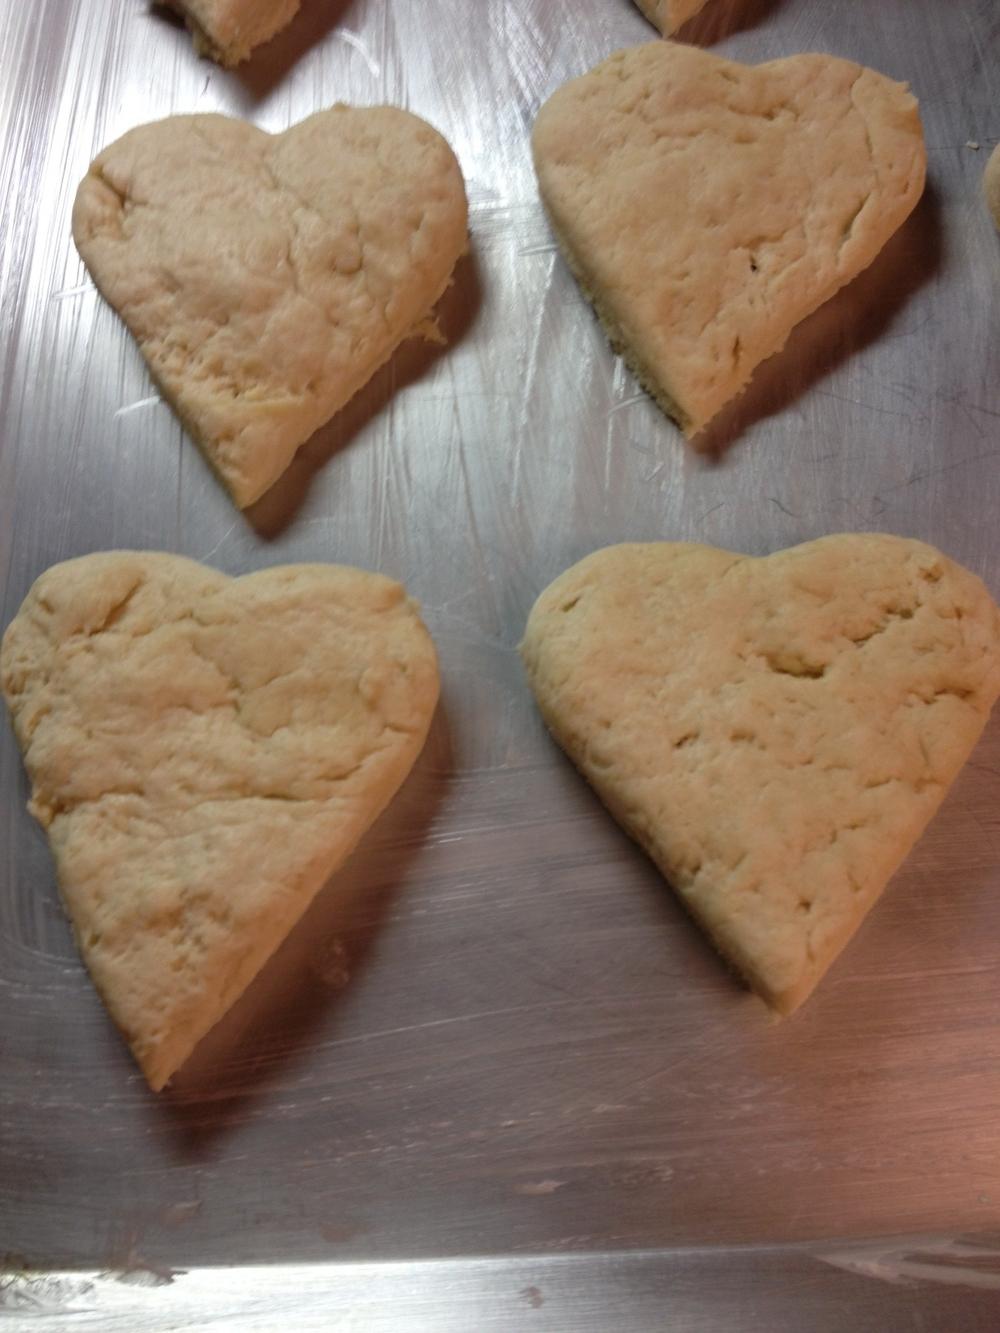 Biscuits 2.jpg